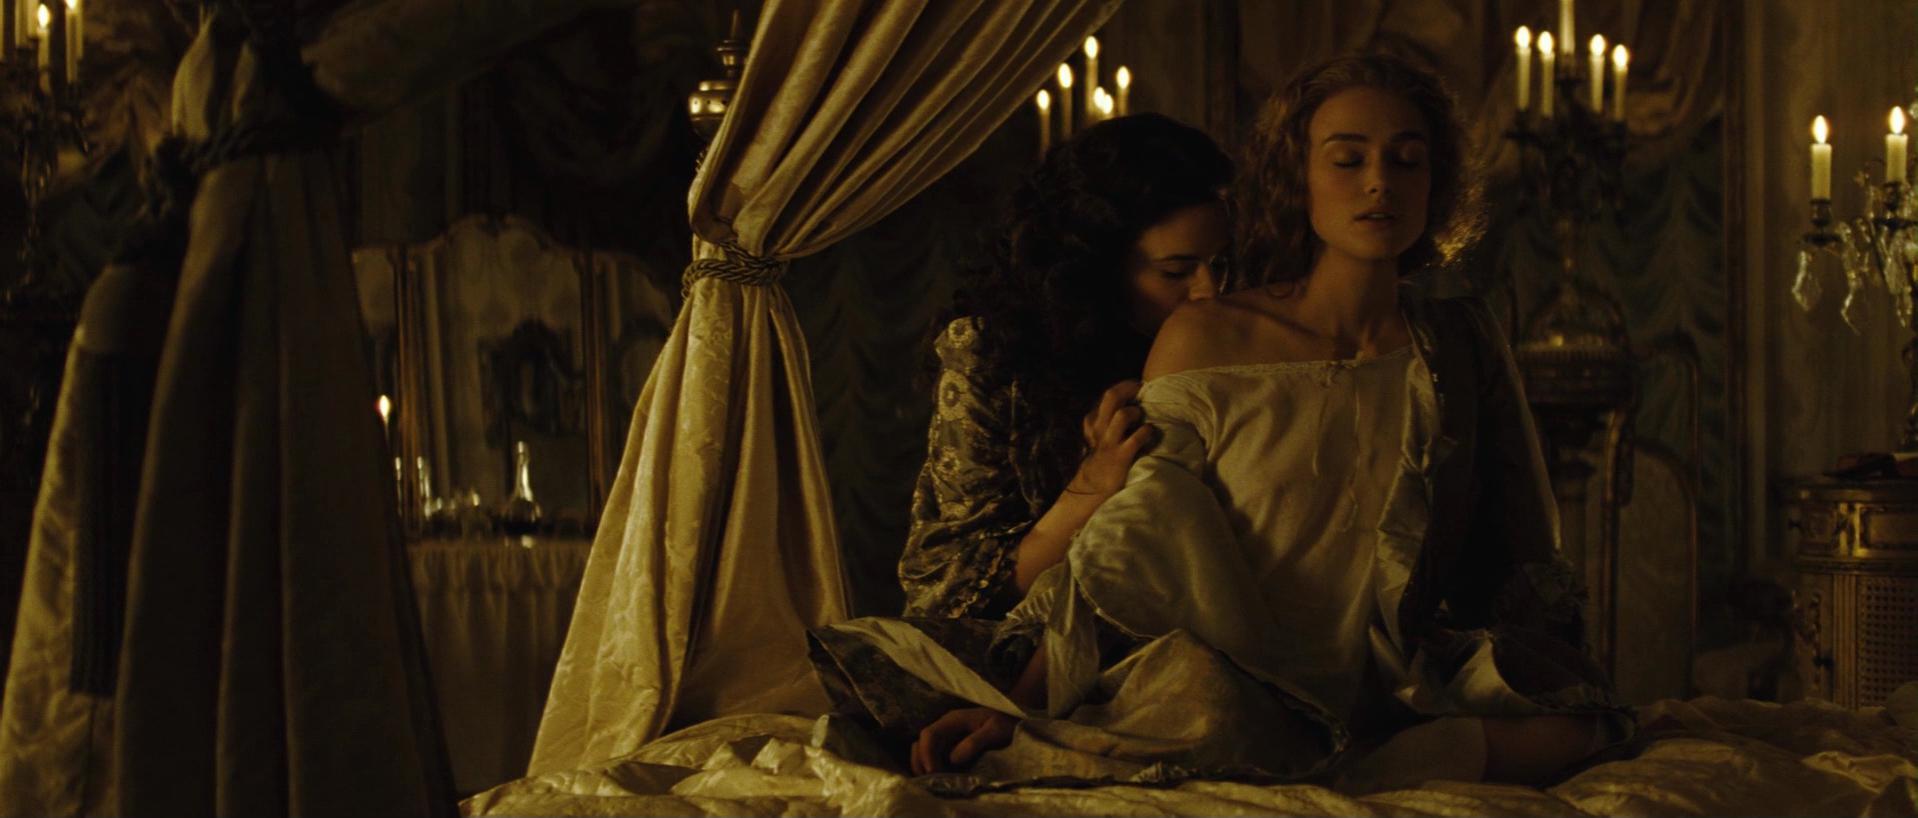 The duchess sex scene video